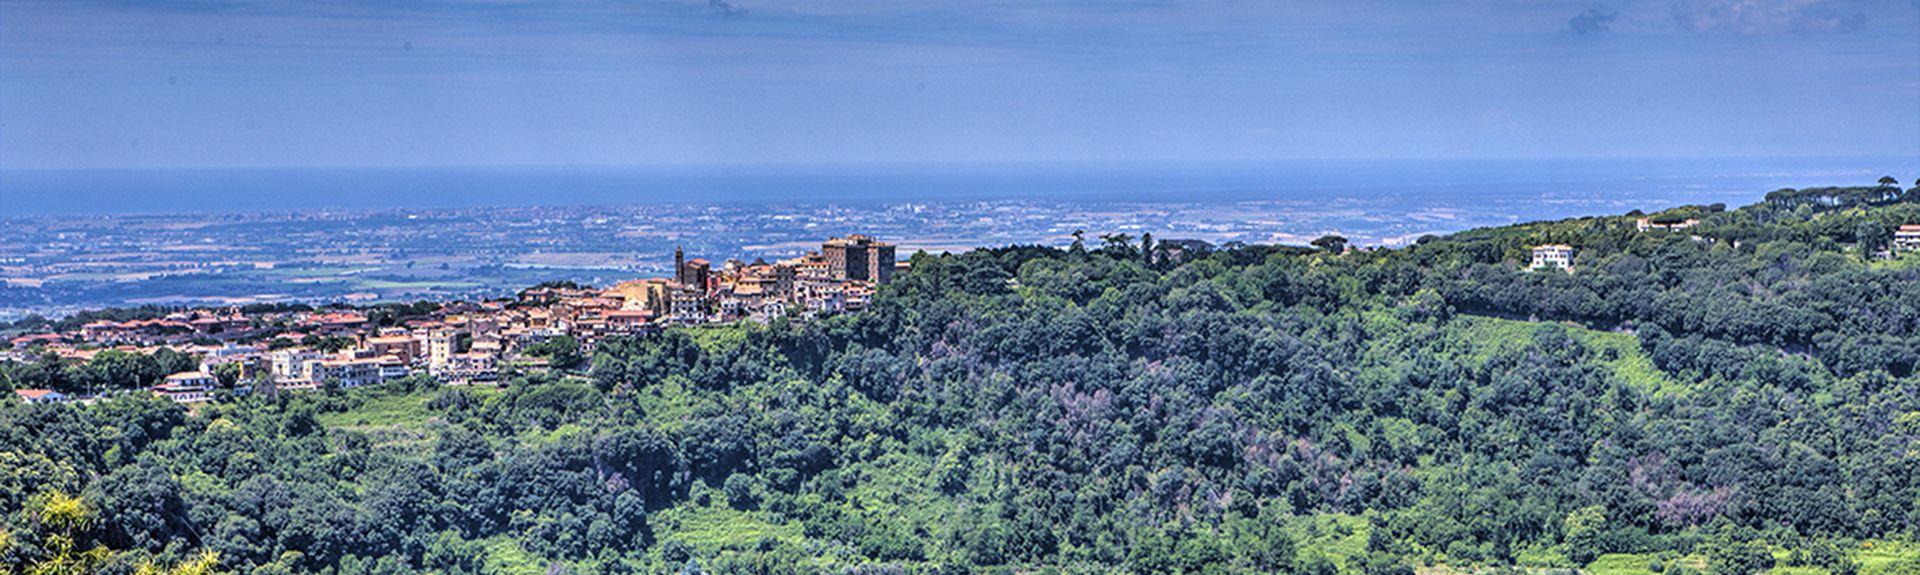 Latina (province), Lazio, Italy